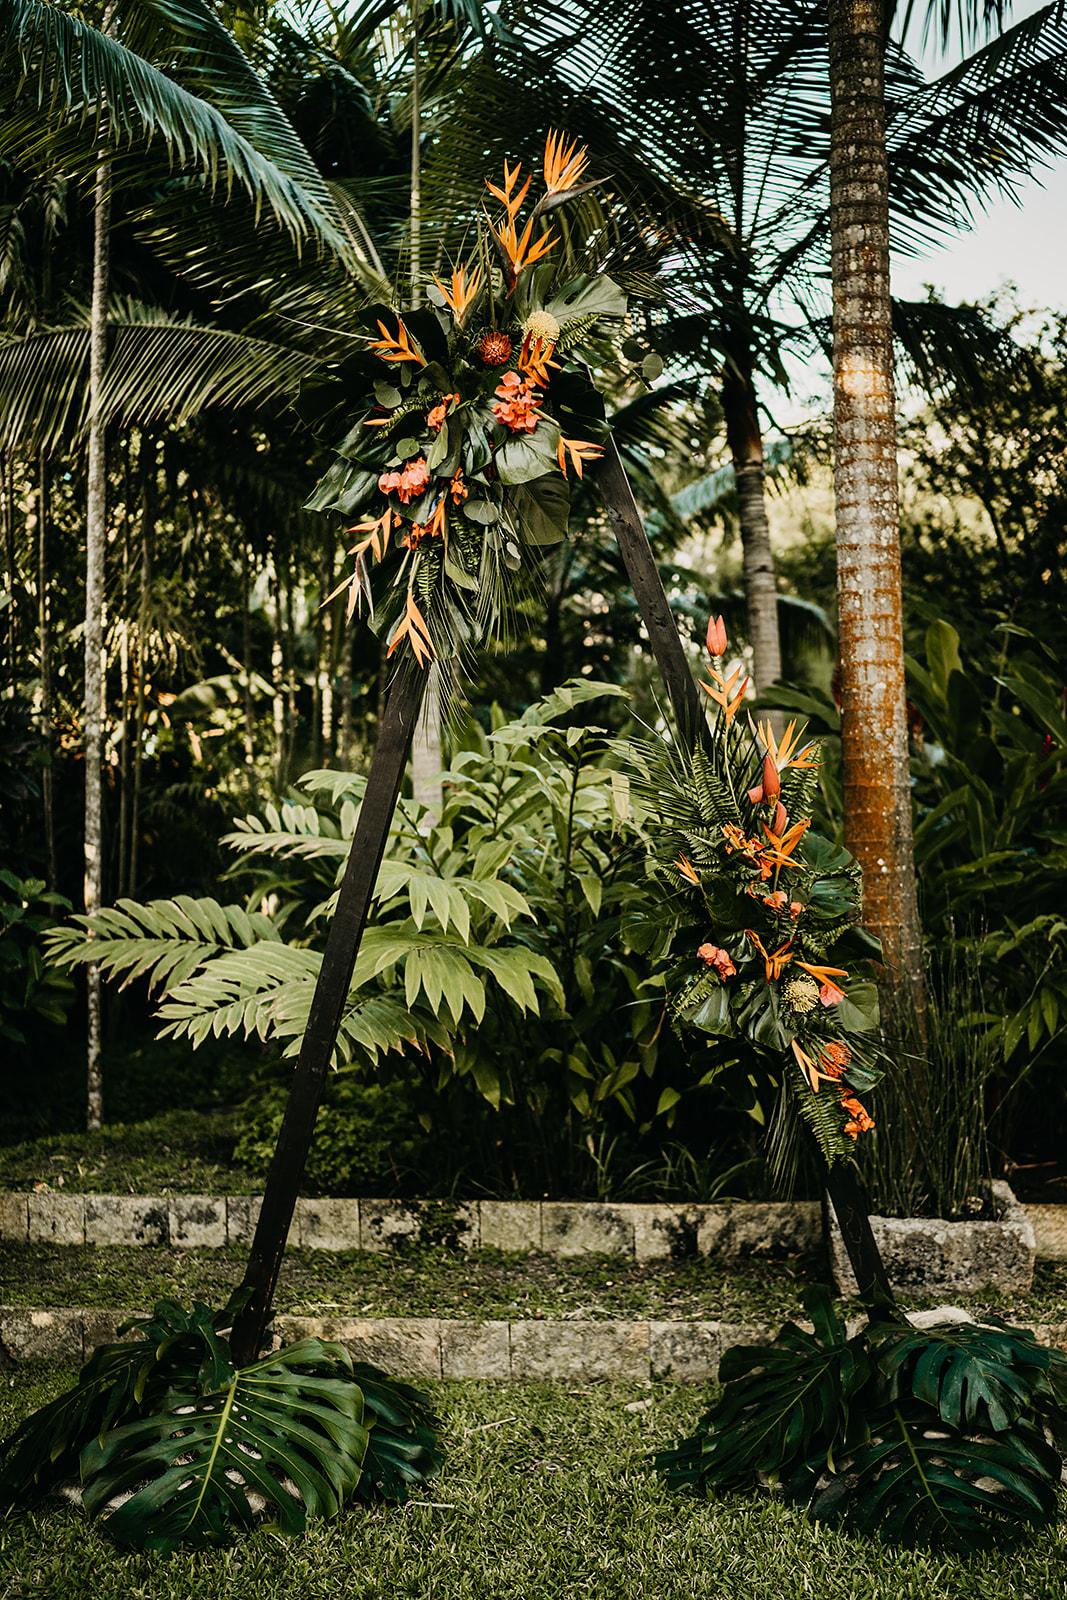 AmandaMarkus-Hacienda-Sac-Chich-Merida-Wedding-426_websize.jpg